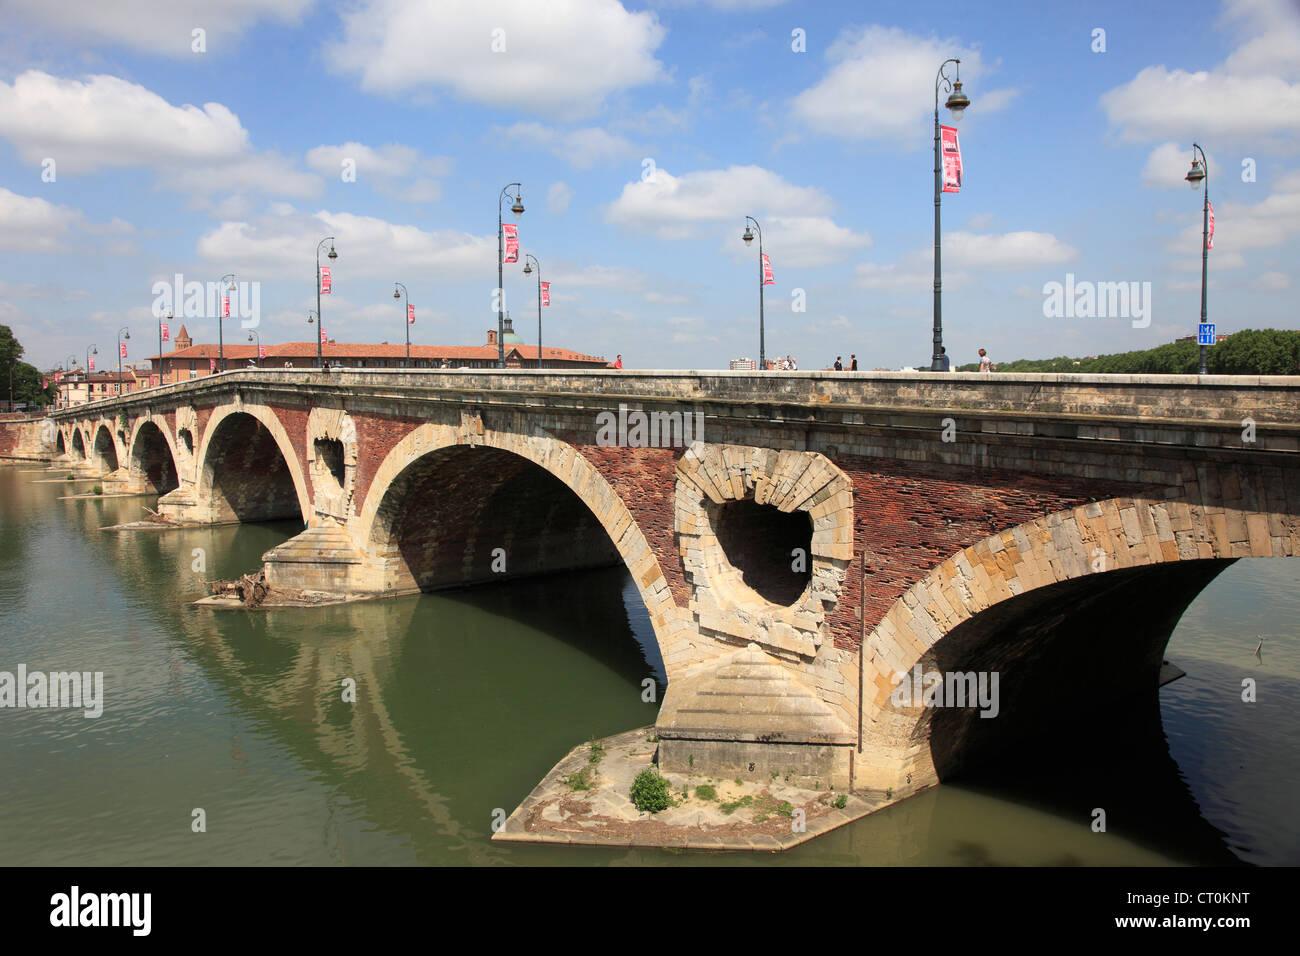 France, Midi-Pyrénées, Toulouse, Pont Neuf, bridge, Garonne River, - Stock Image